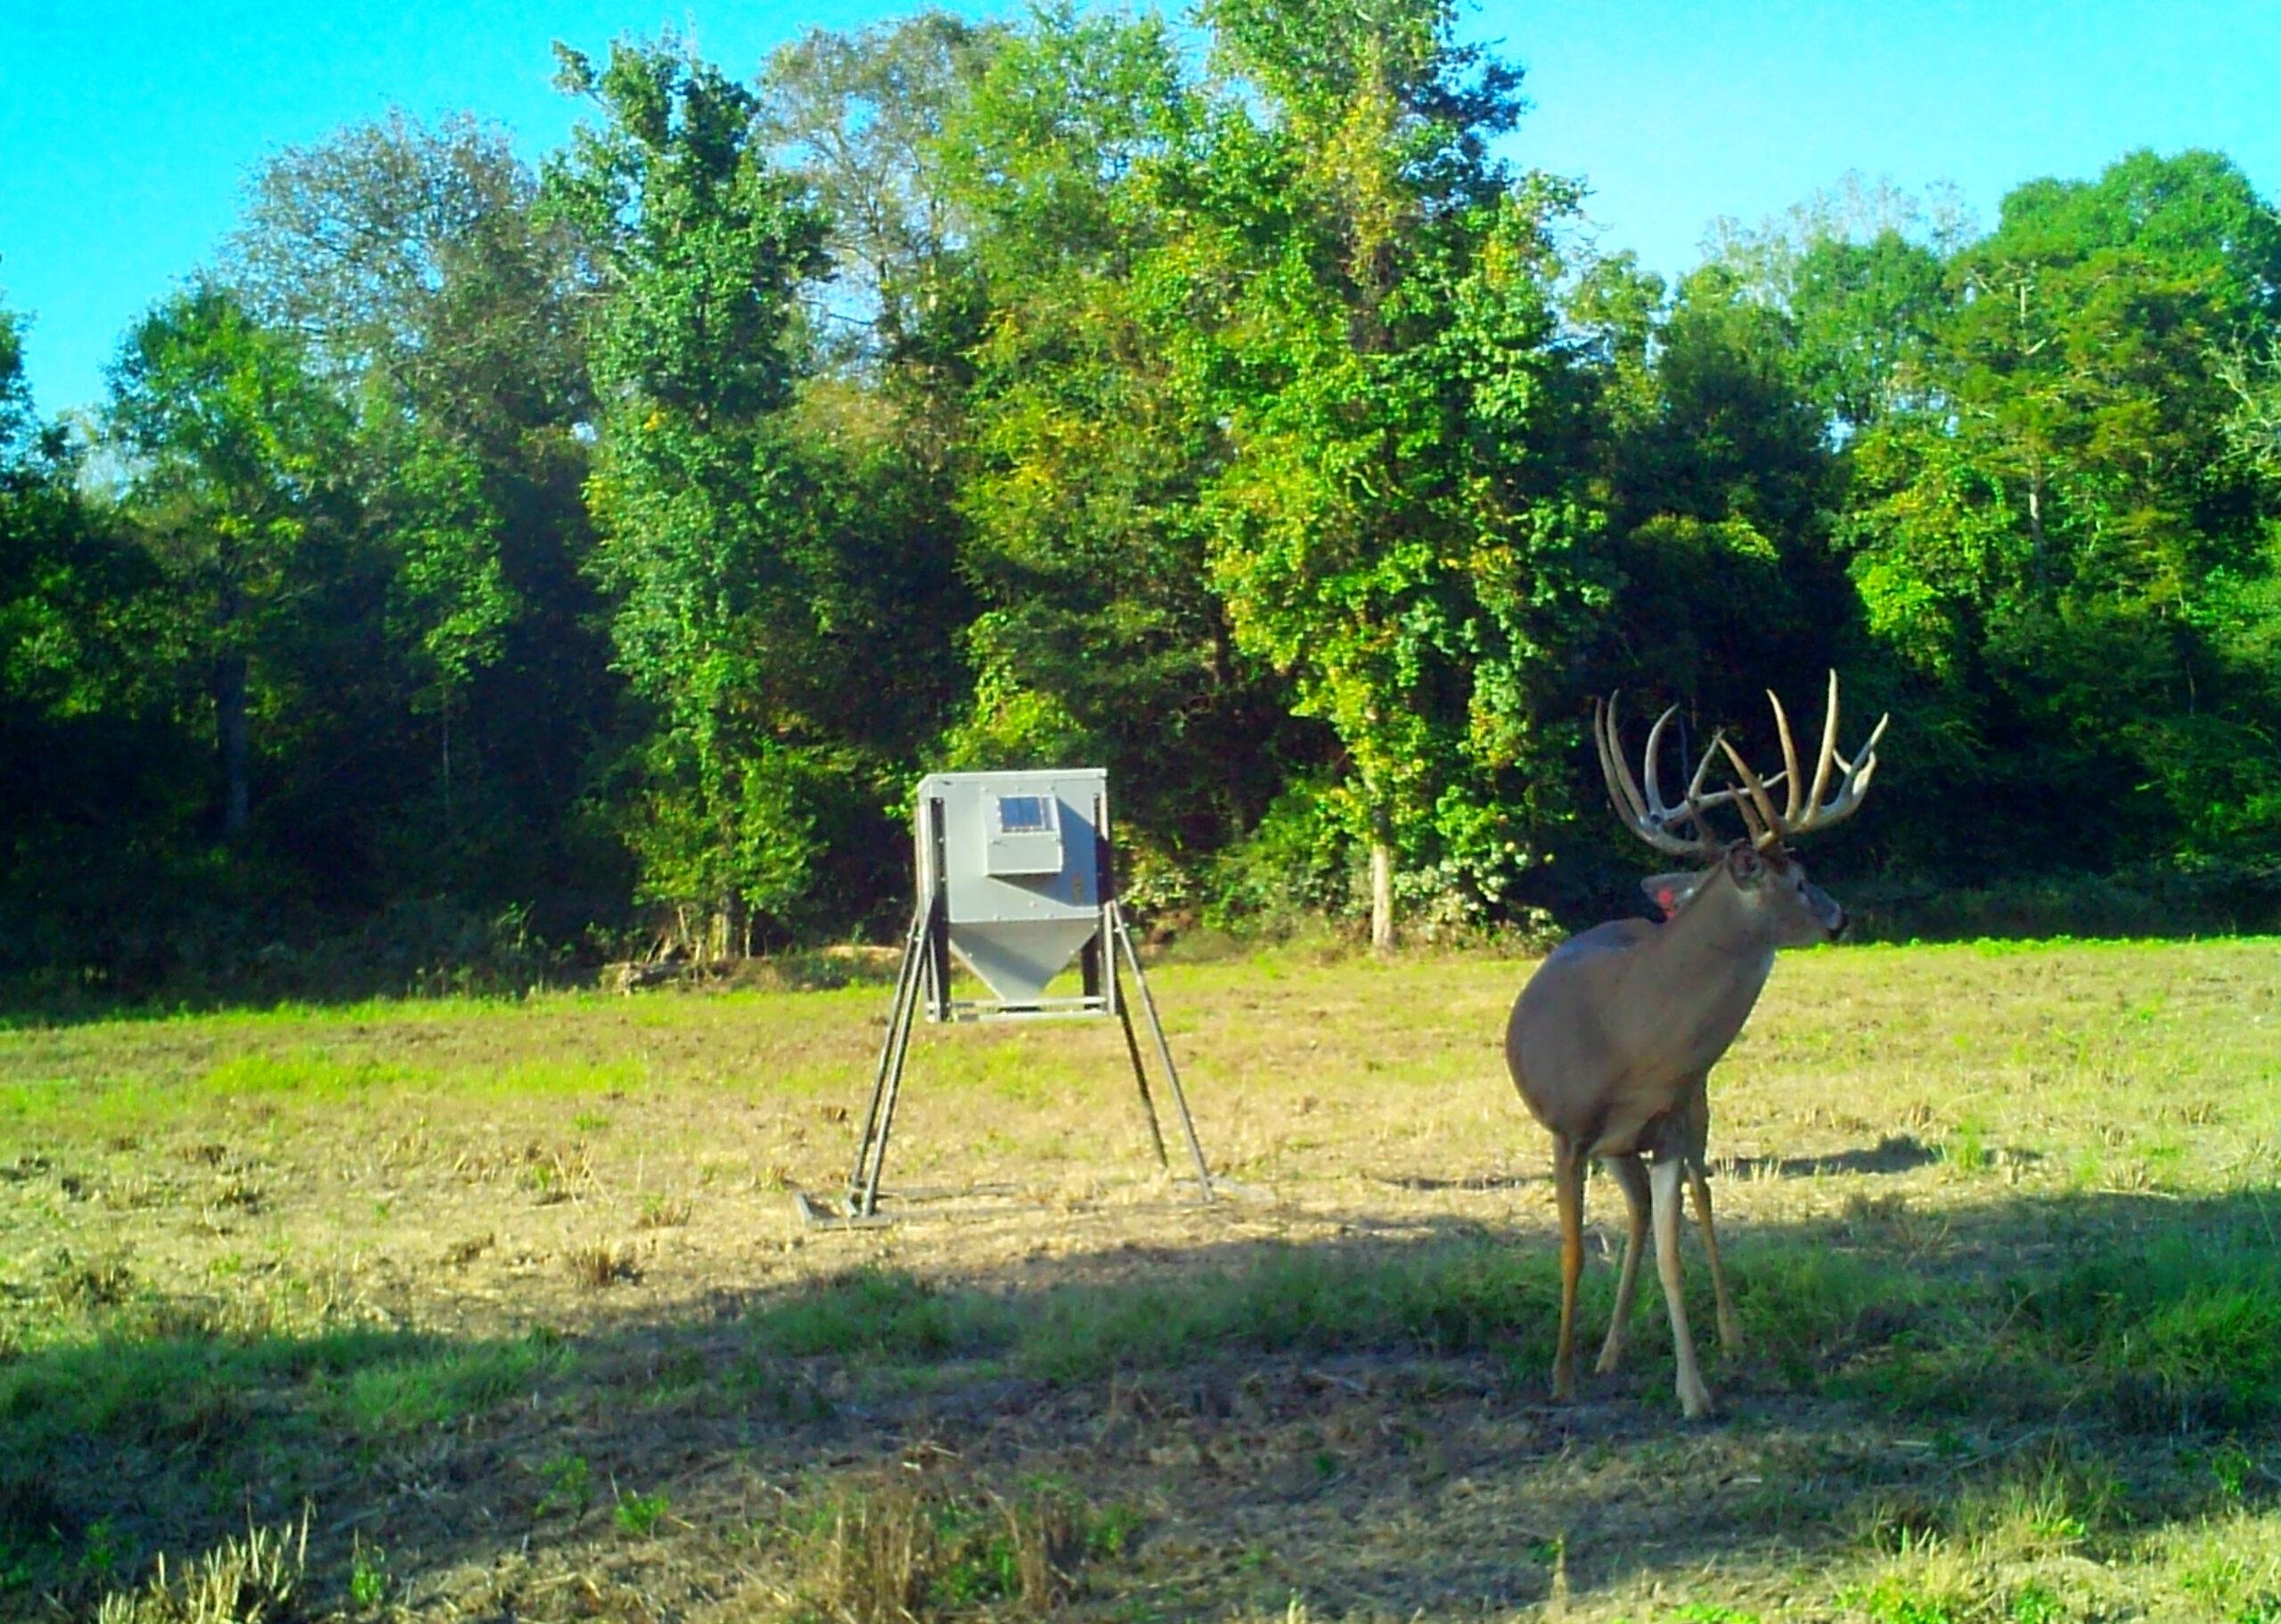 Louisiana Guided Deer Hunting | Whitetail Deer Hunts